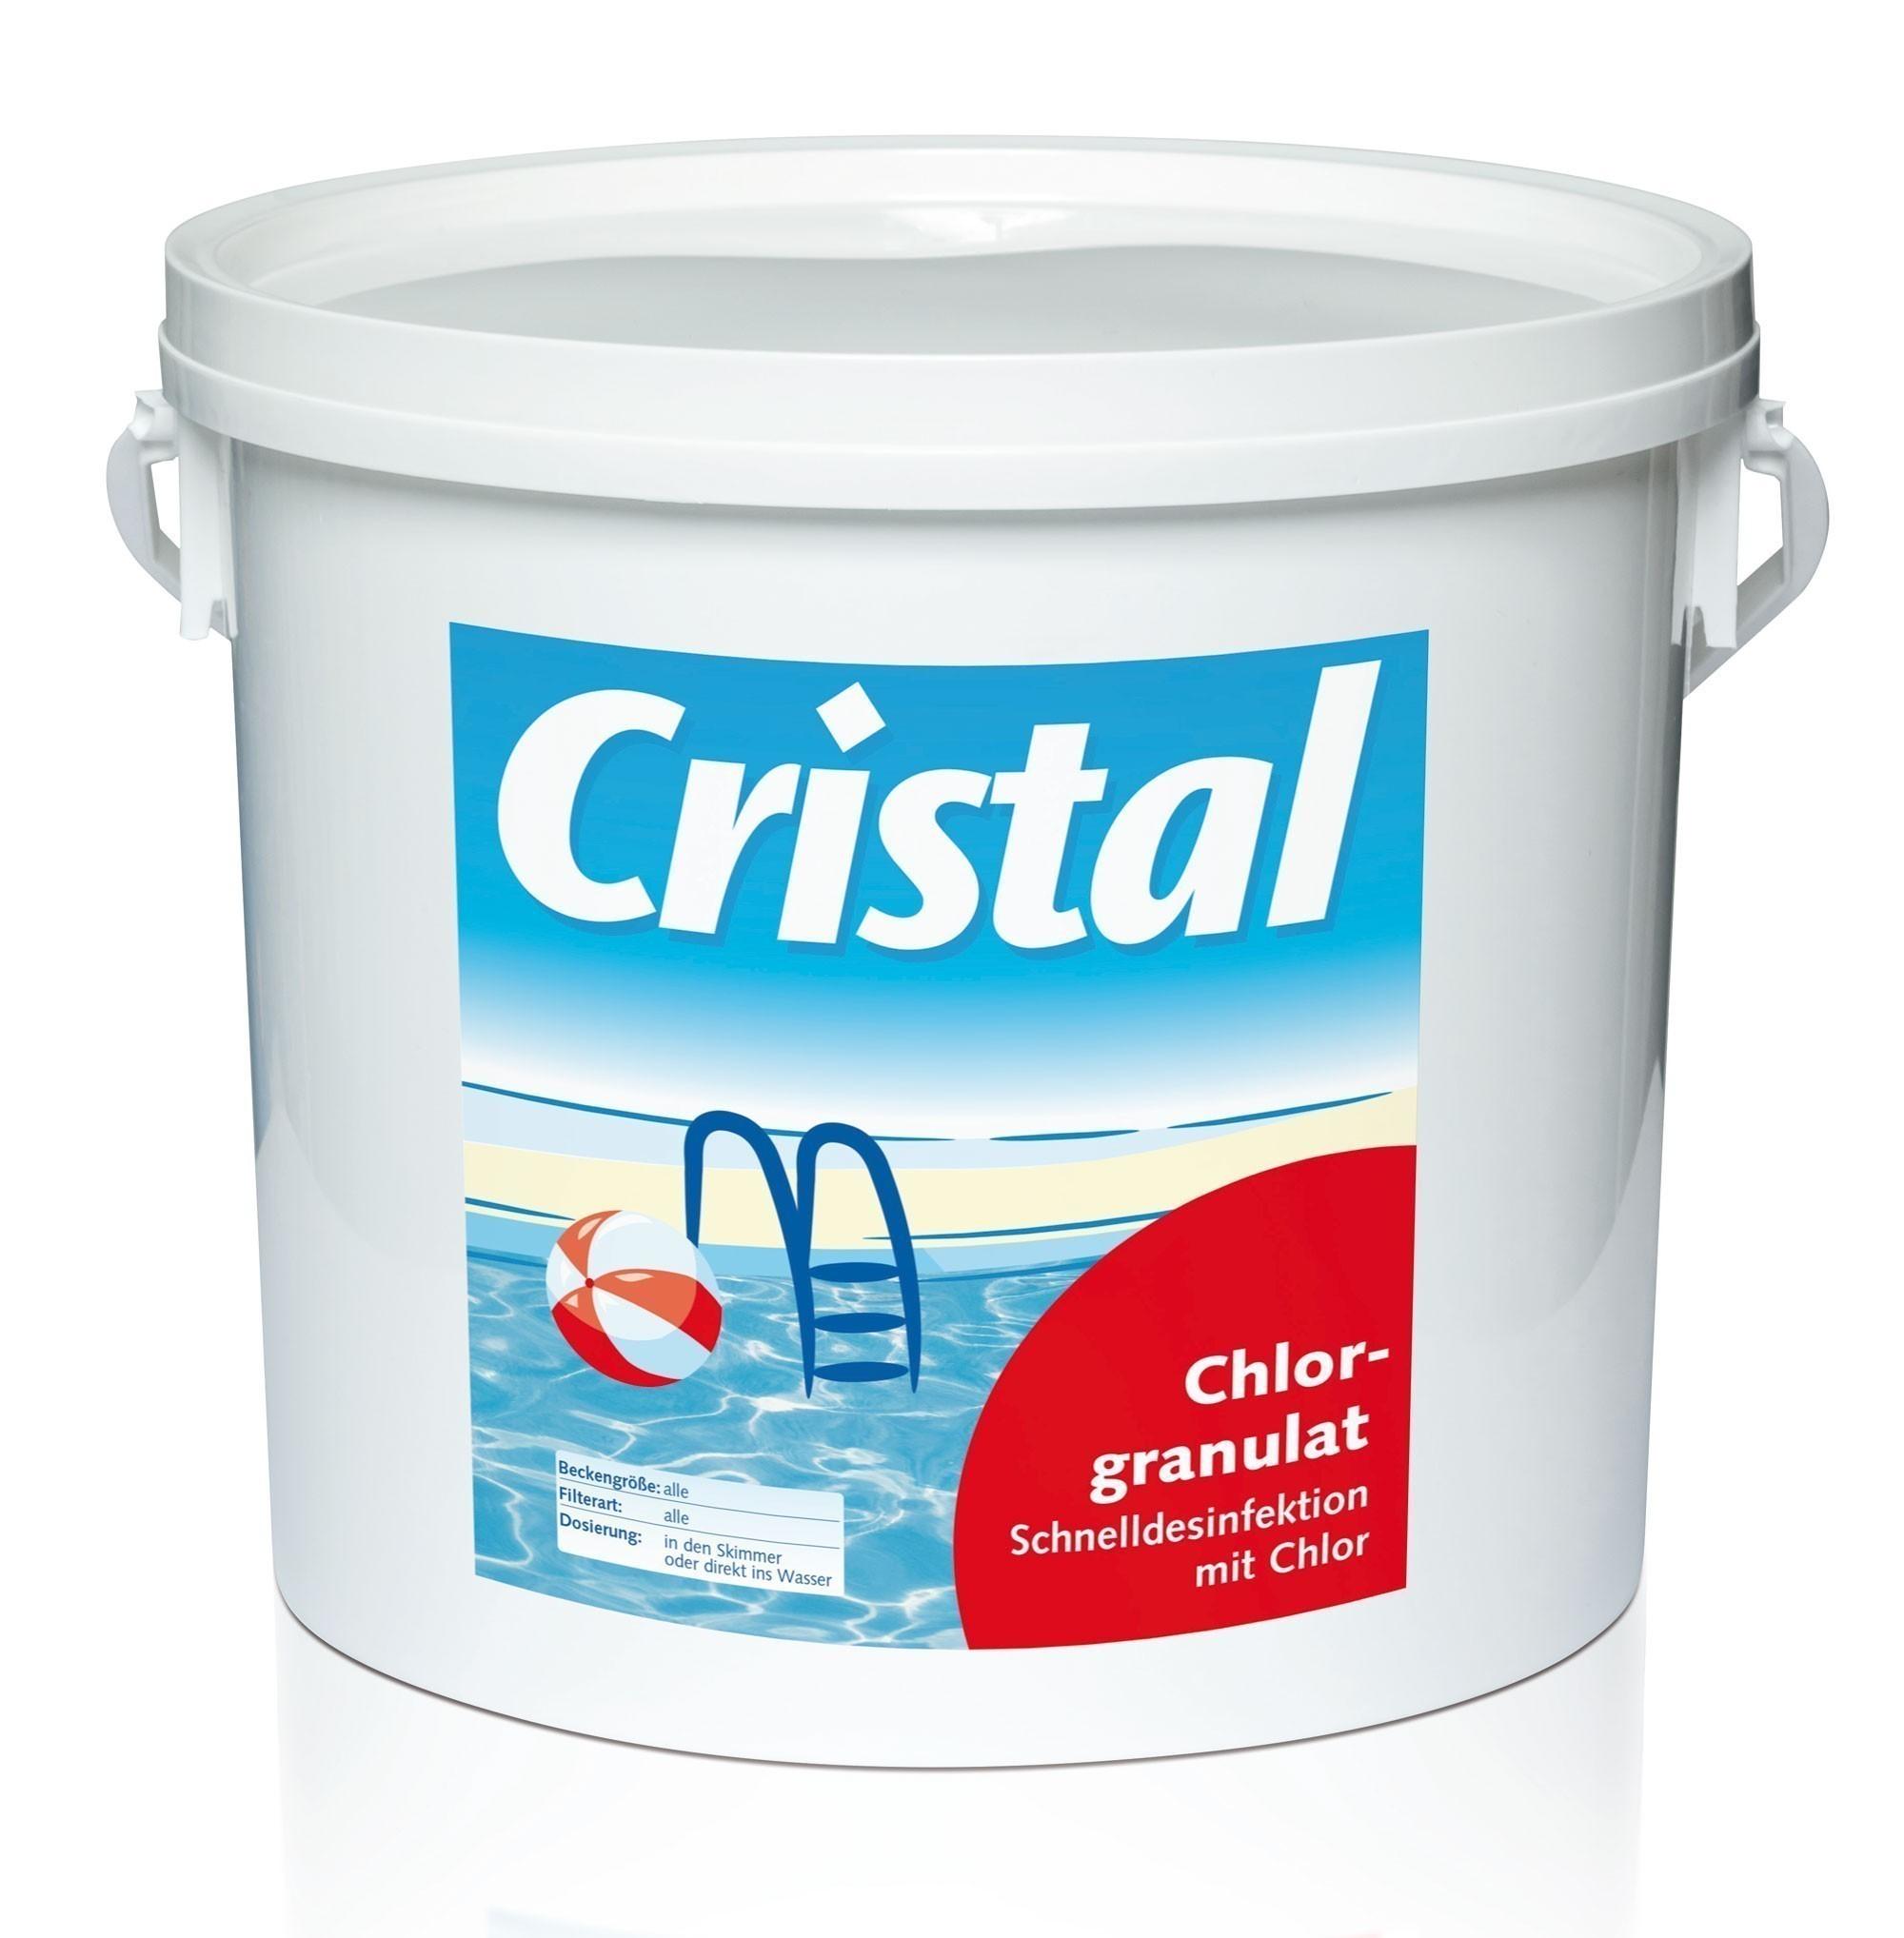 Cristal Wasserpflege Chlorgranulat 5 kg Bild 1